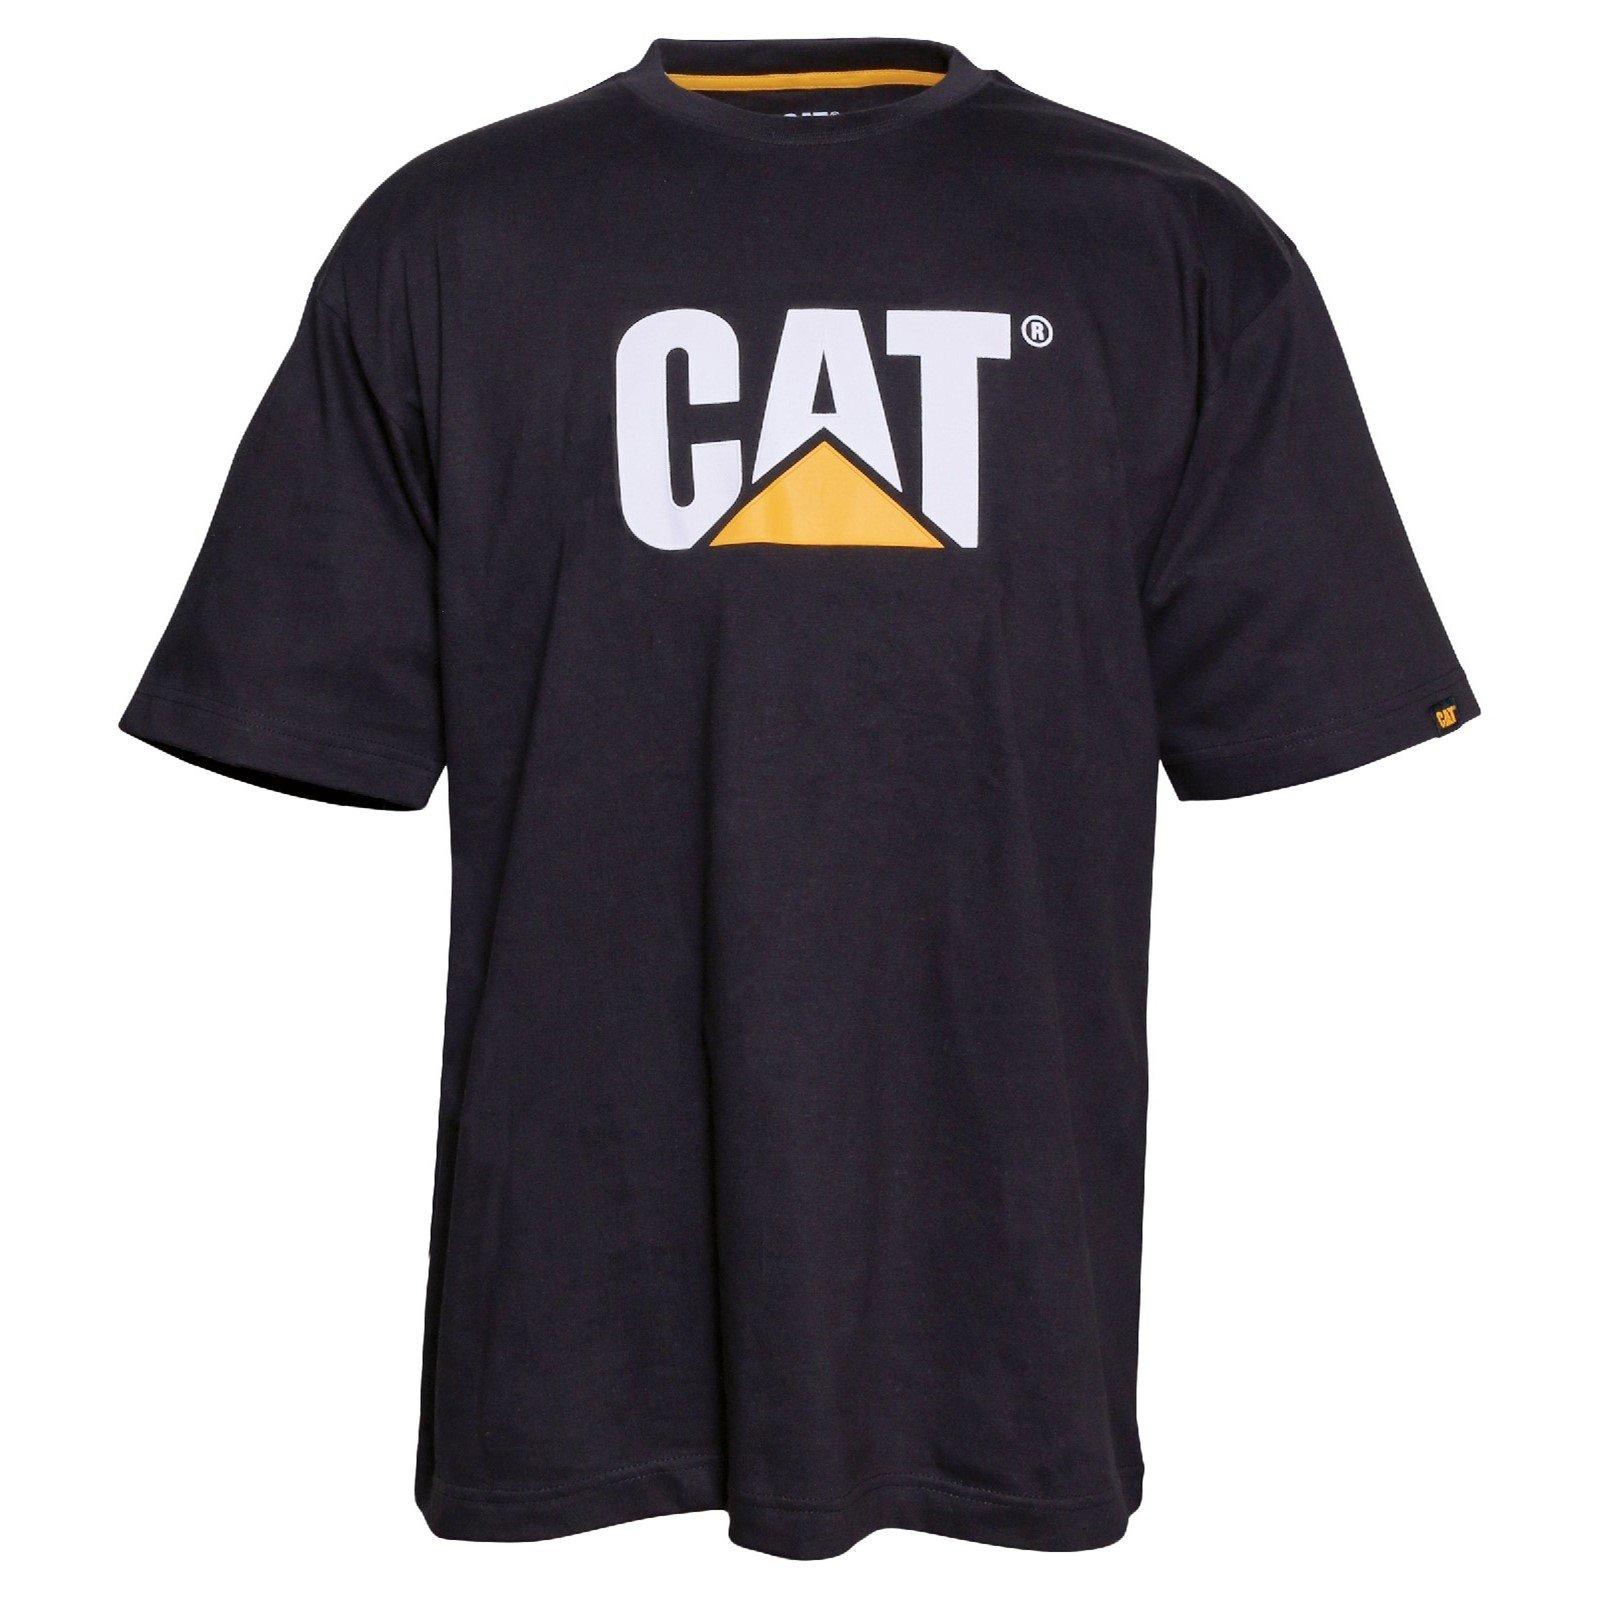 Caterpillar Men's Trademark Logo T-Shirt Various Colours 25301-42086 - Black Sml